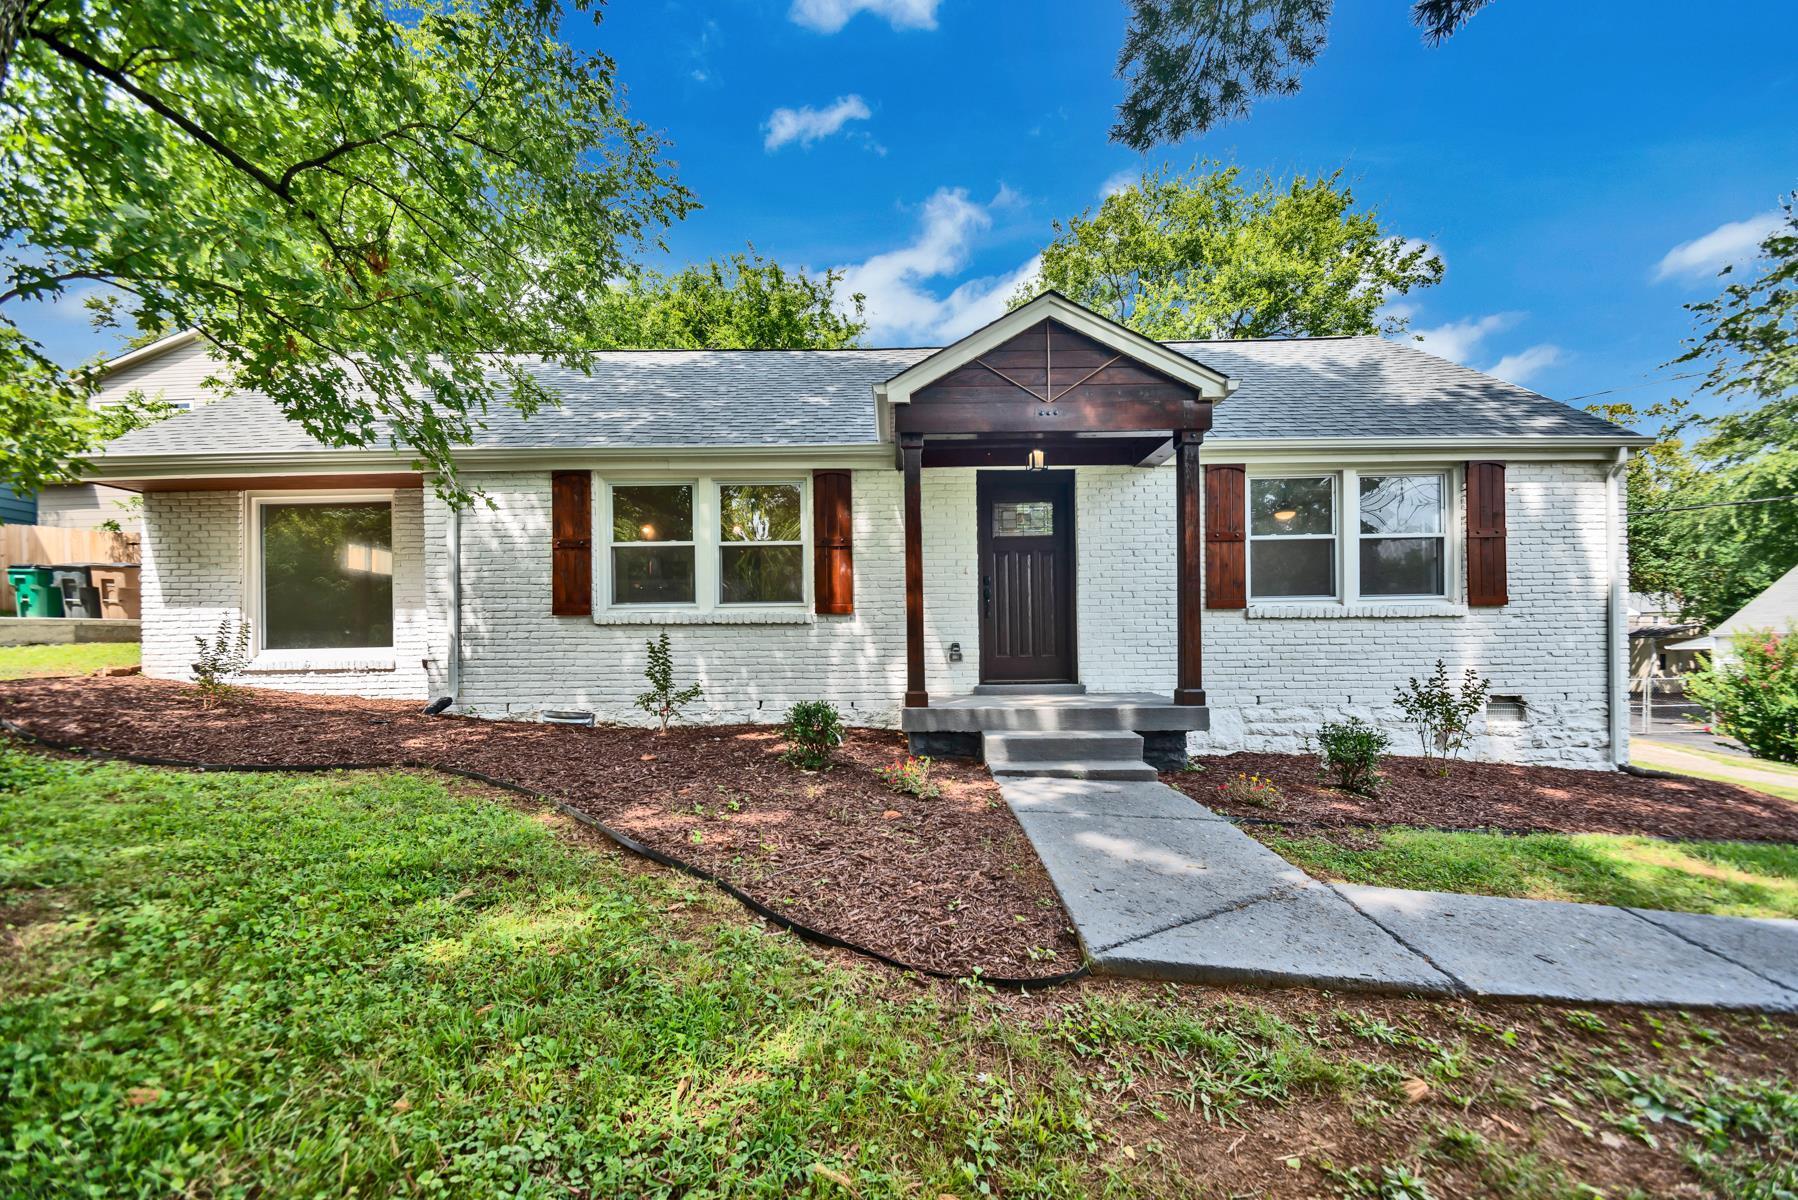 1802 Sherwood Ln, Nashville, TN 37216 - Nashville, TN real estate listing